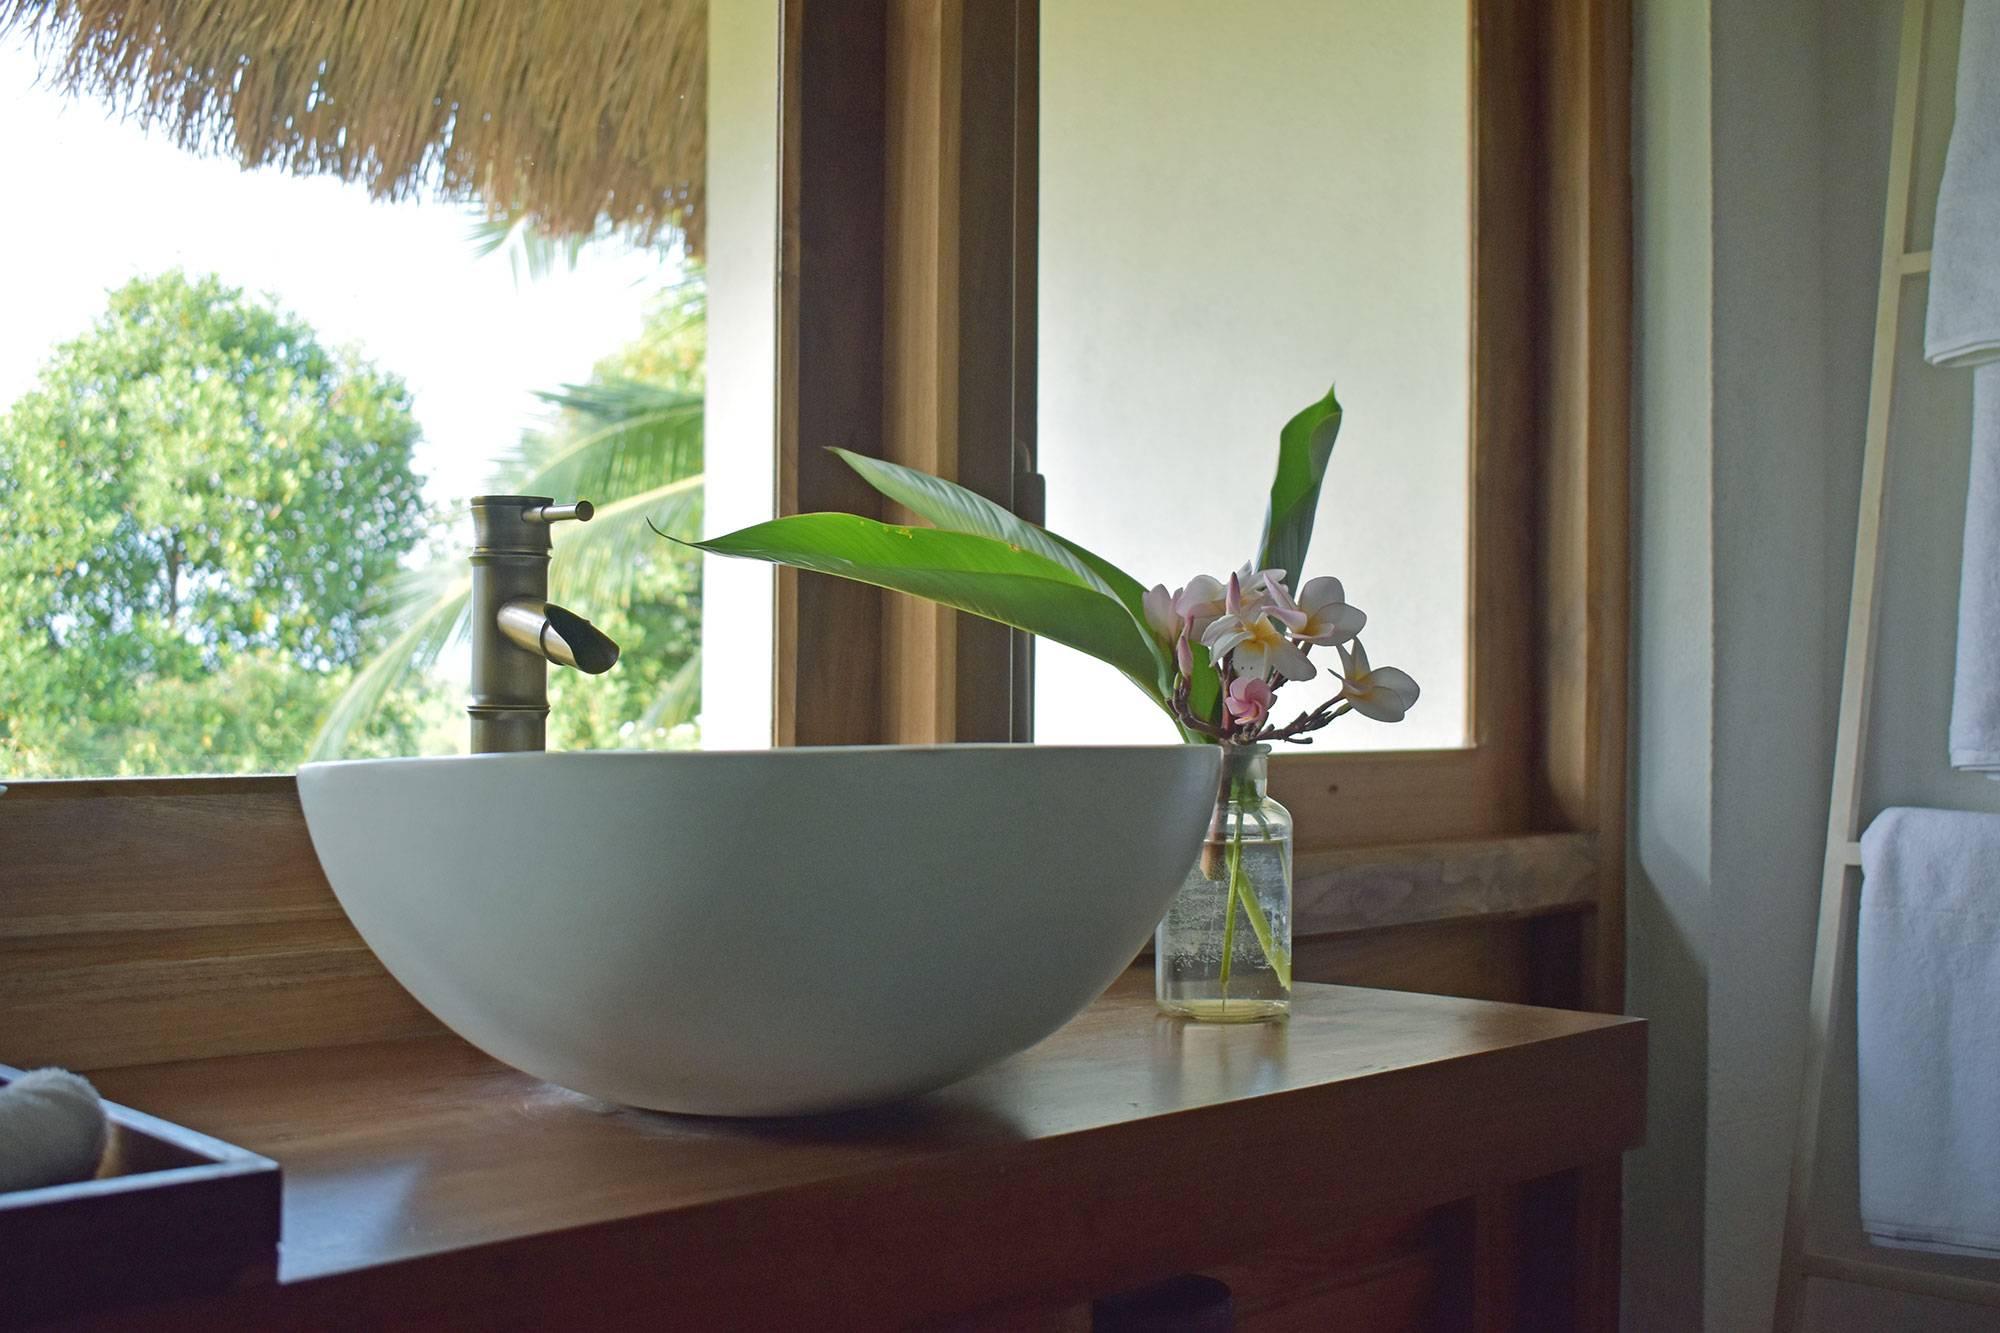 https://www.soulandsurf.com/wp-content/uploads/2021/07/Tekanda-RoomsCopy-of-Tek-Sink-window.jpg